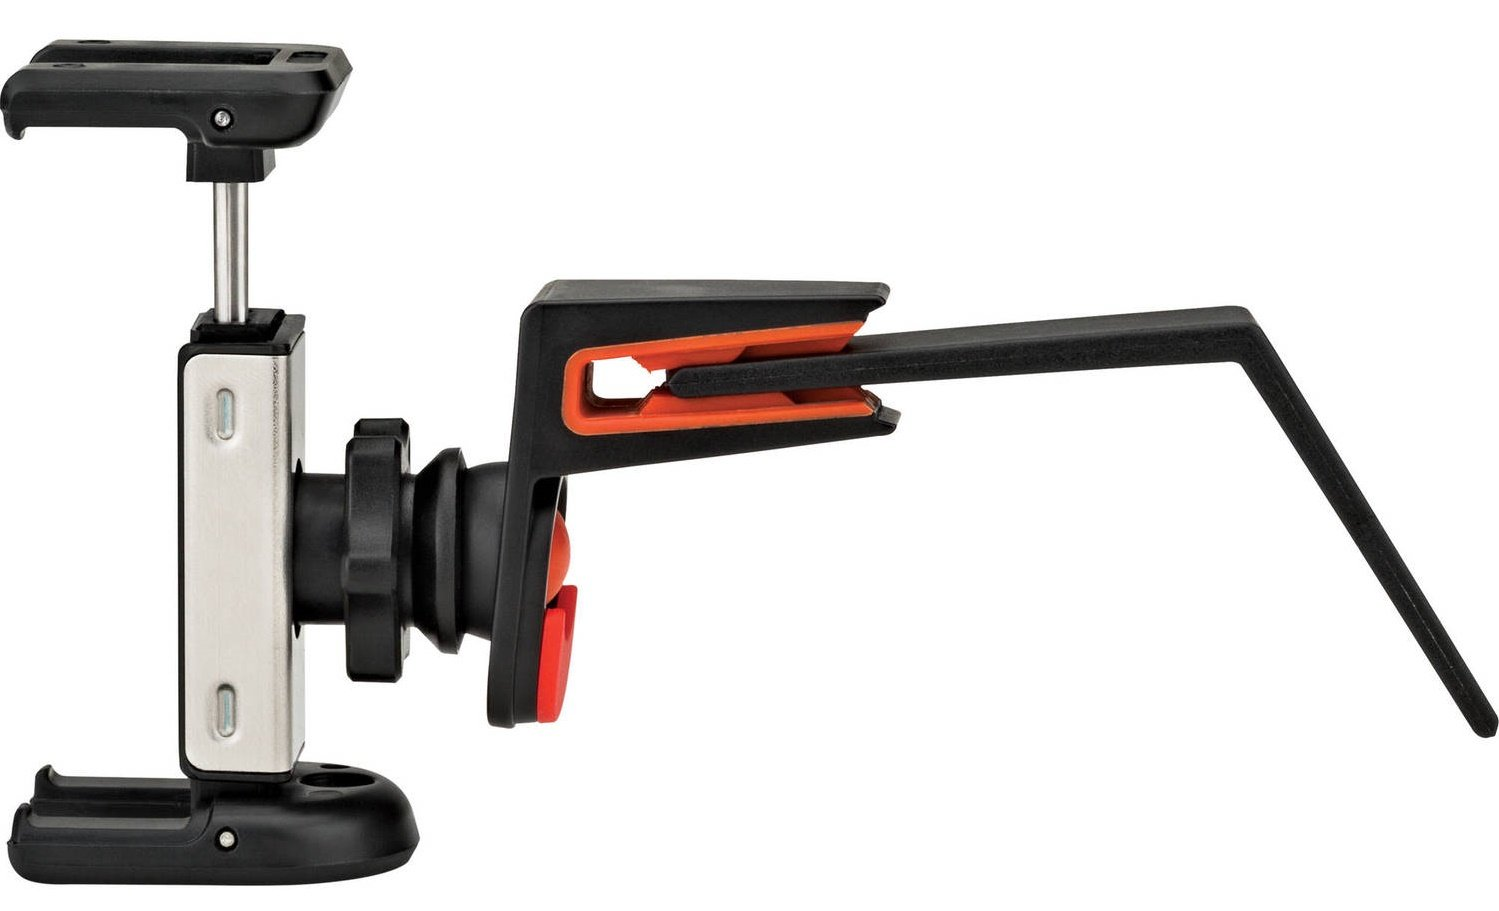 JOBY GripTight Auto ventclip XL - držák telefonu do auta